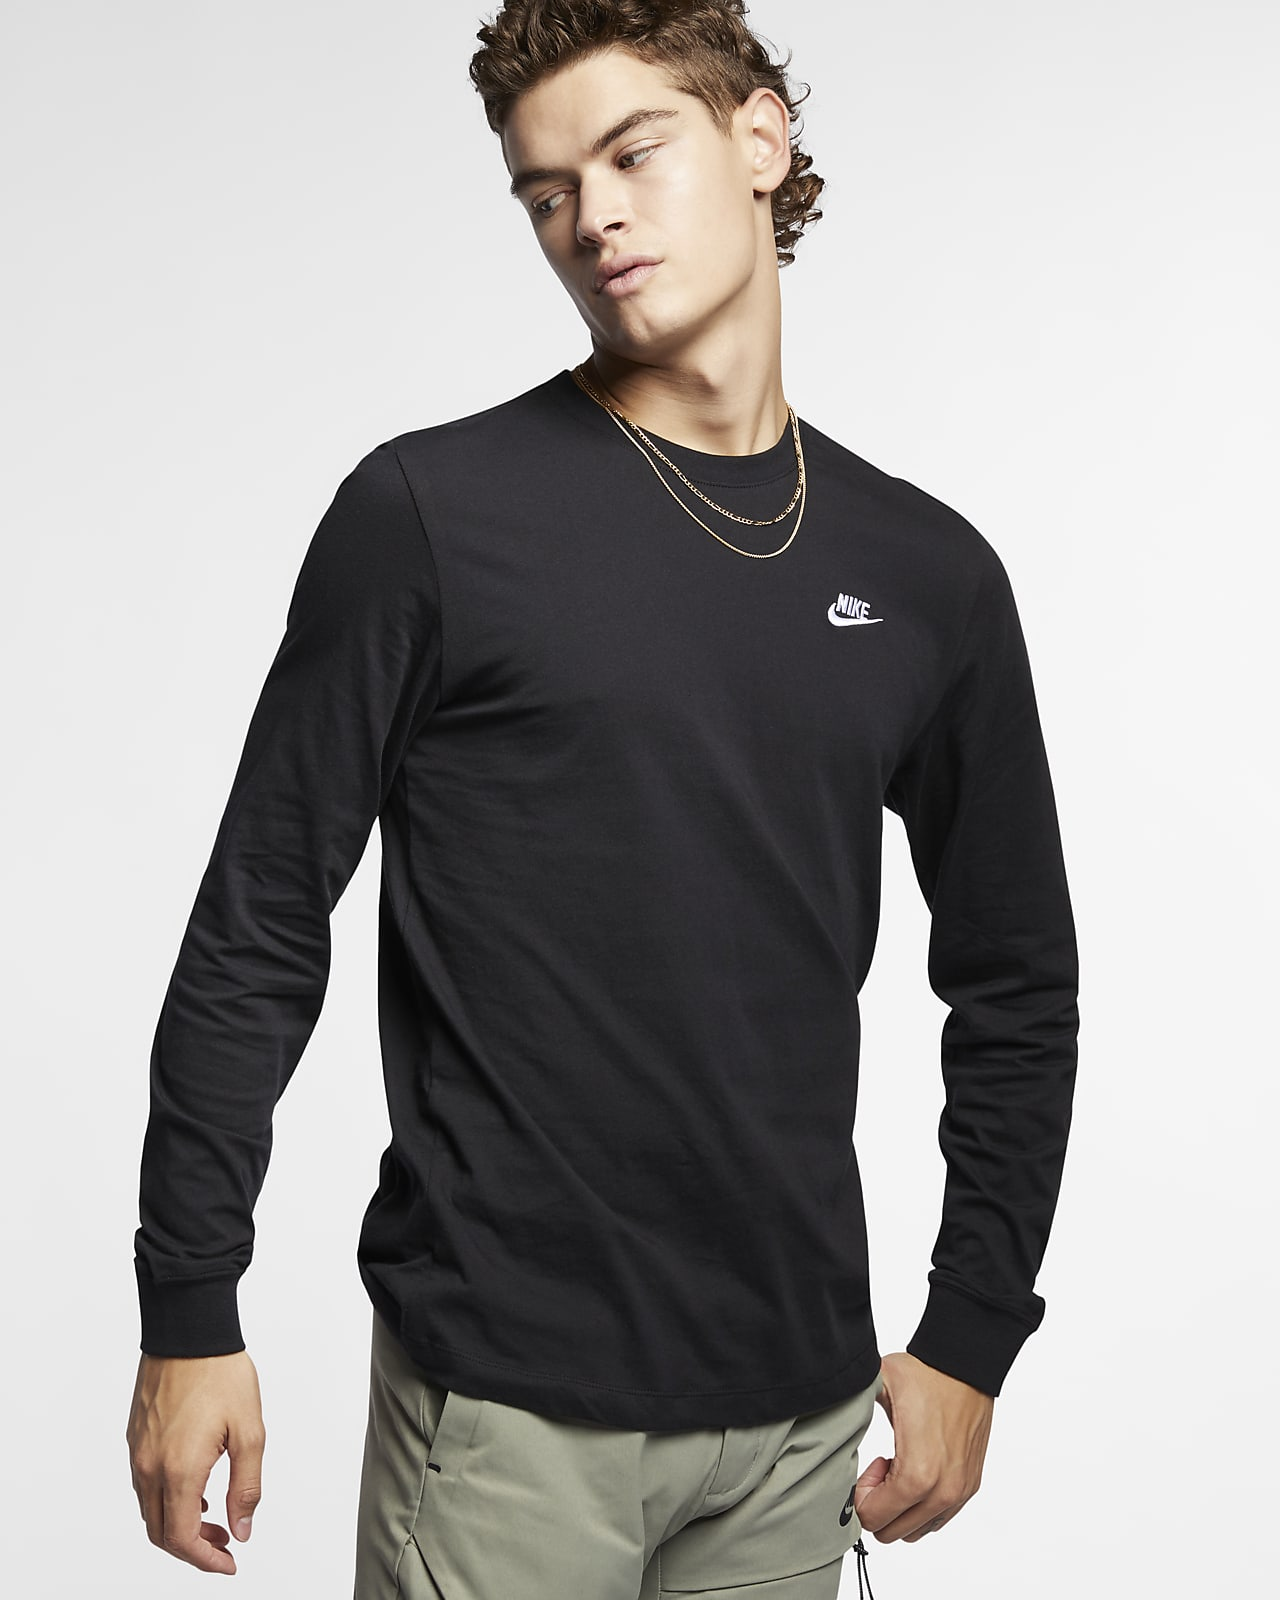 Мужская футболка с длинным рукавом Nike Sportswear